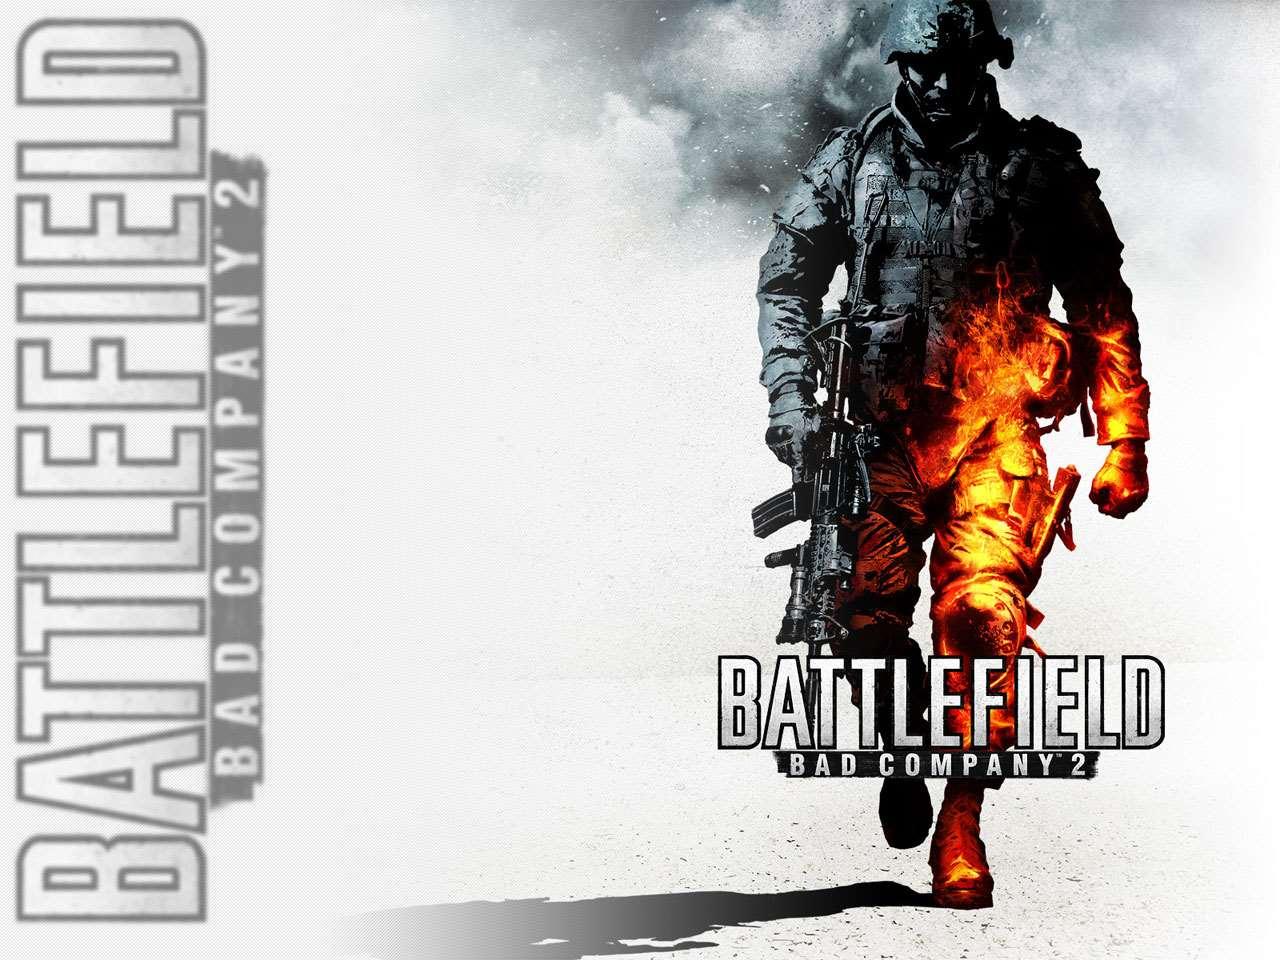 Battlefield Bad Company 2 Battlefield Bad Company 2 Wallpaper